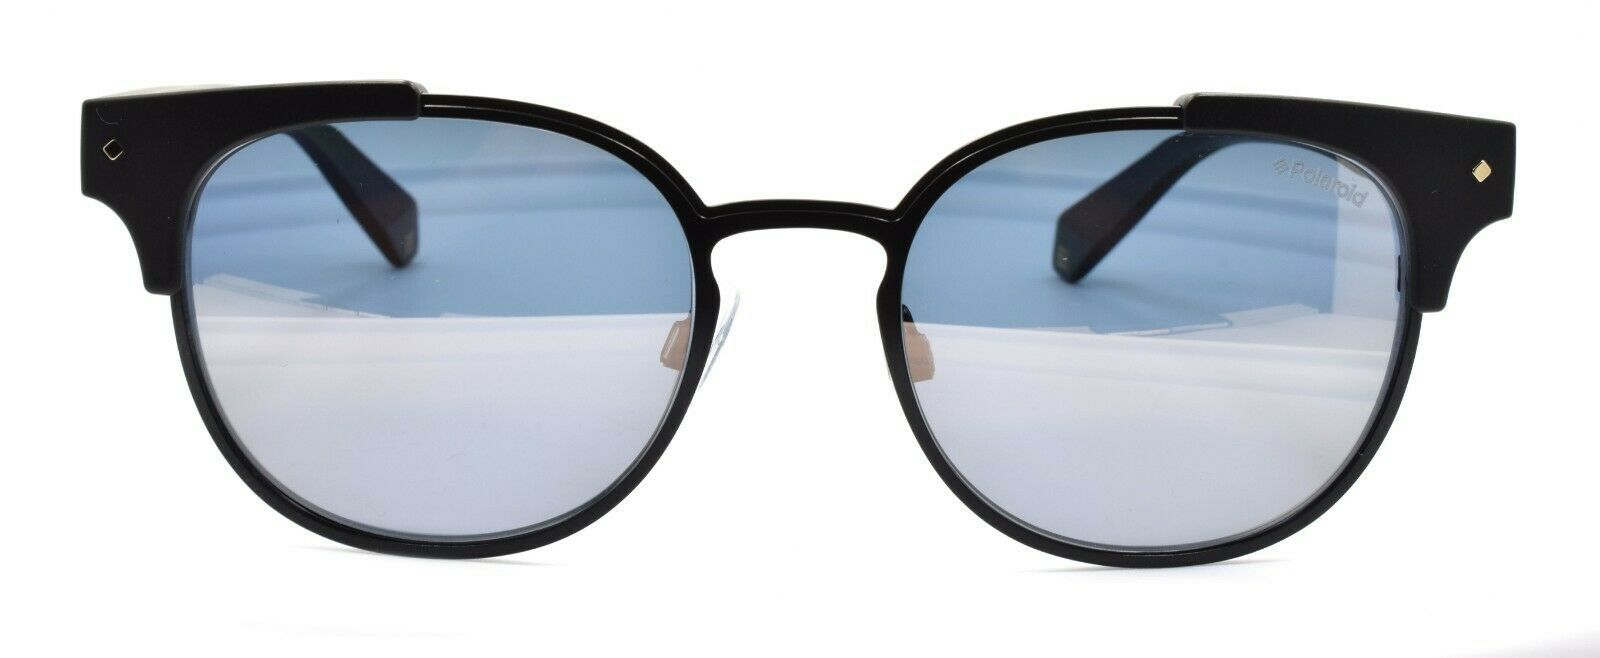 Polaroid PLD 6040/S/X 003LM Men's Sunglasses Polarized 52-19-140 Black Mirrored